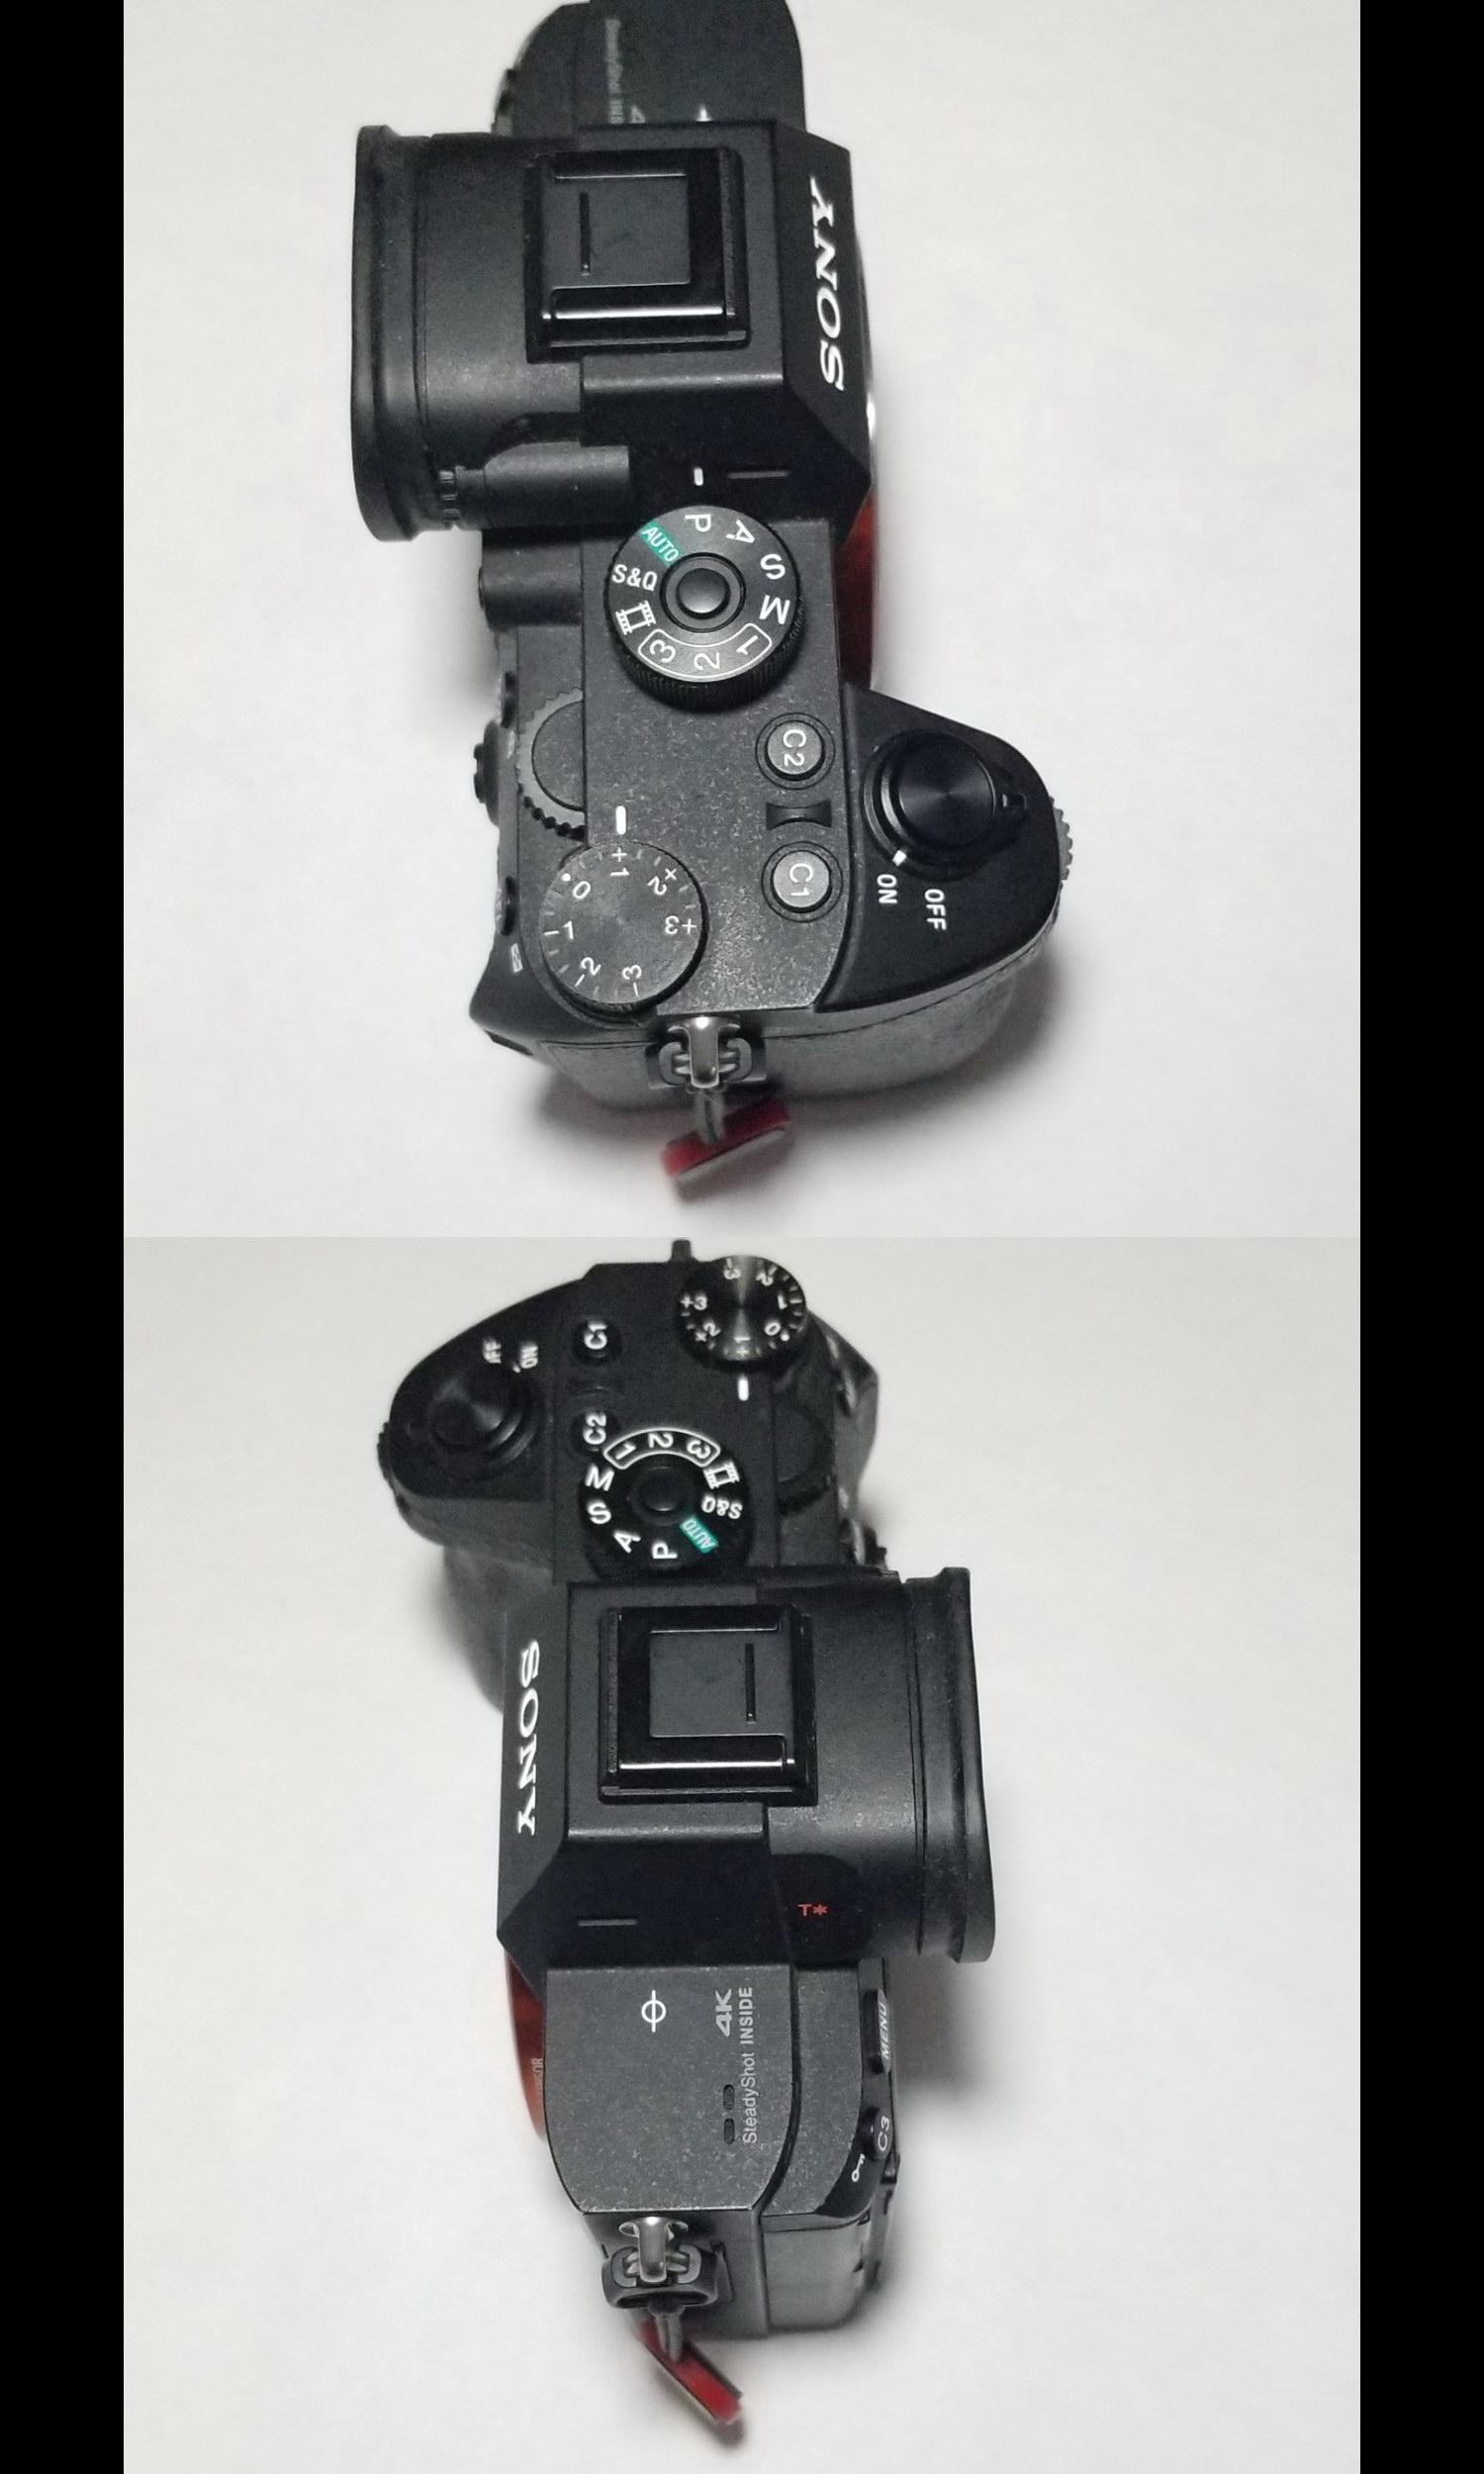 Sold: Nikon D850. Sony A7RIII. Profoto B2 KIT. Sony lens 24-70GM. 16-35GM. 70-200GM - FM Forums